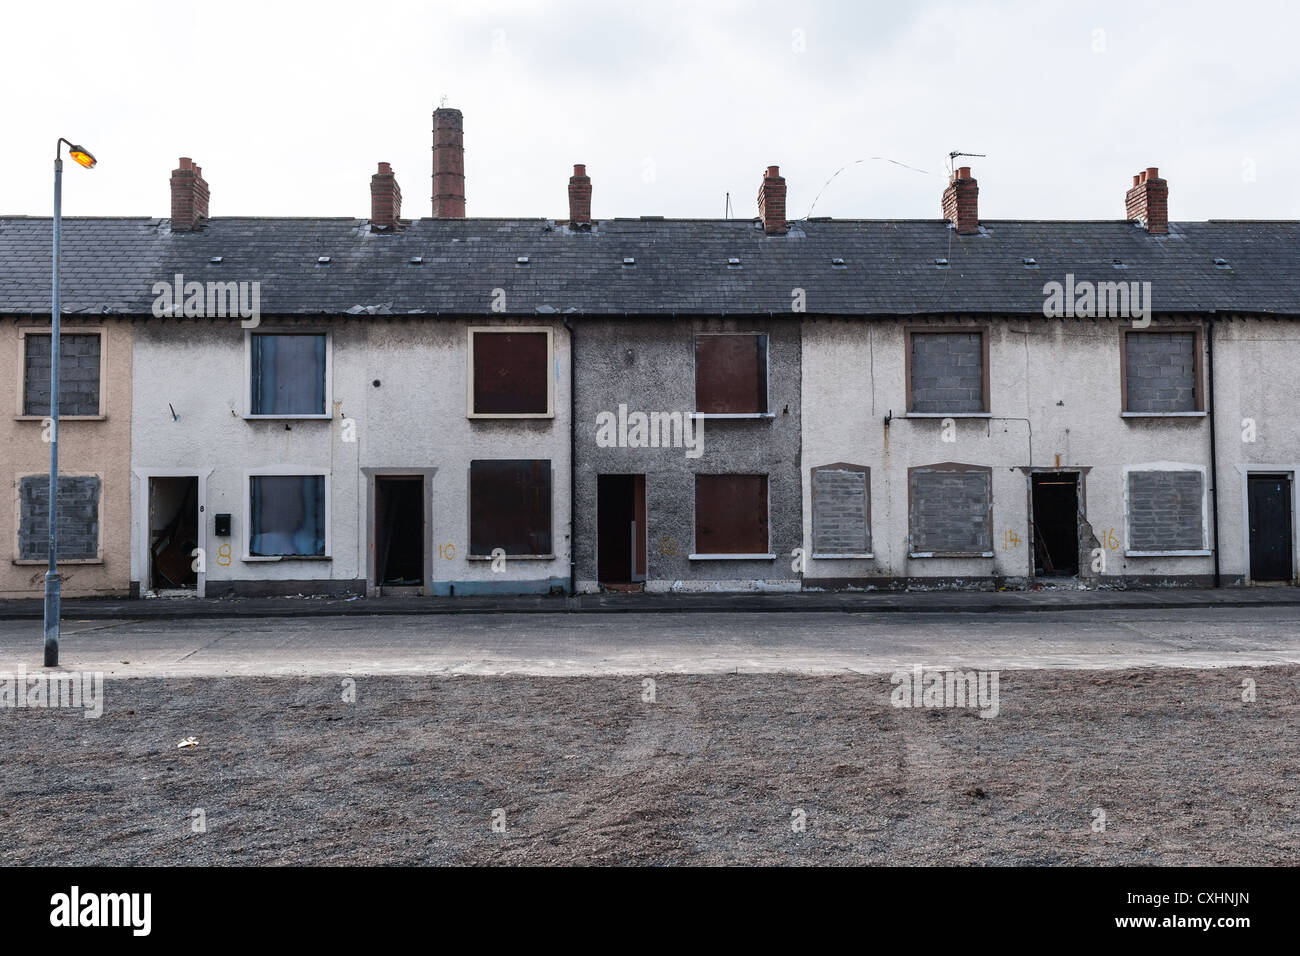 Street in Belfast under demolition. - Stock Image